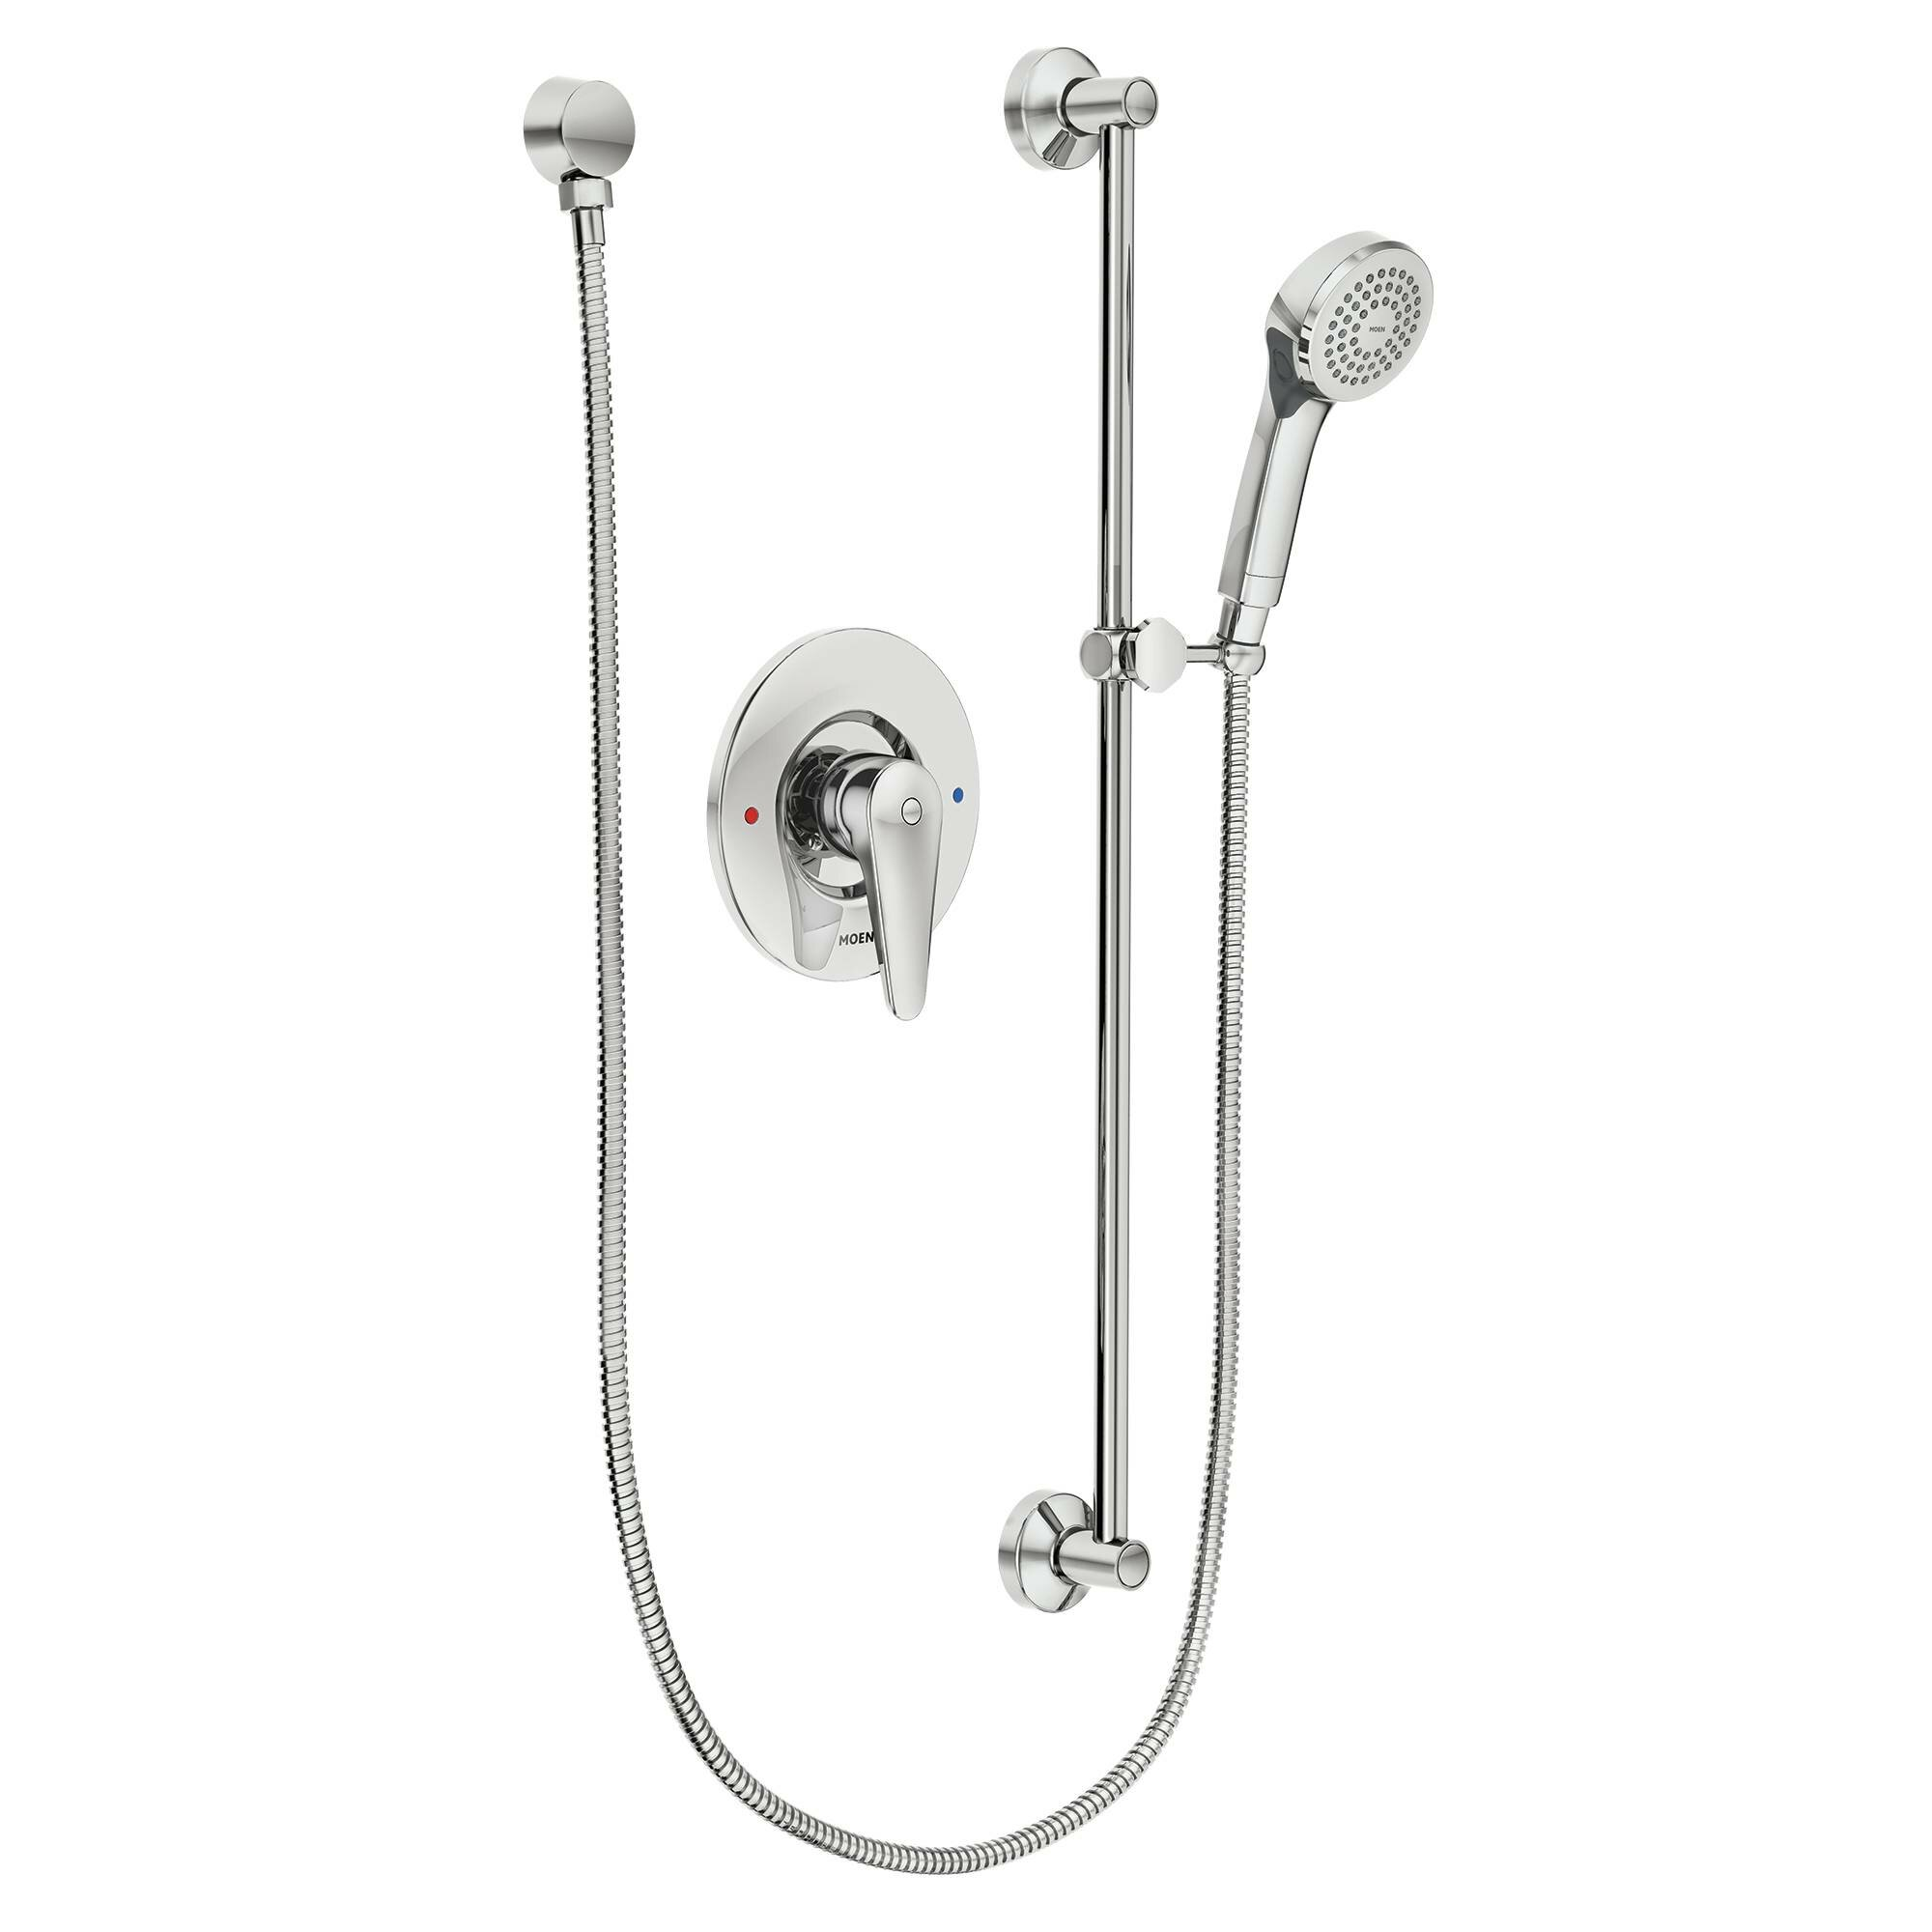 Moen Commercial Handheld Shower System with Slide Bar | Wayfair